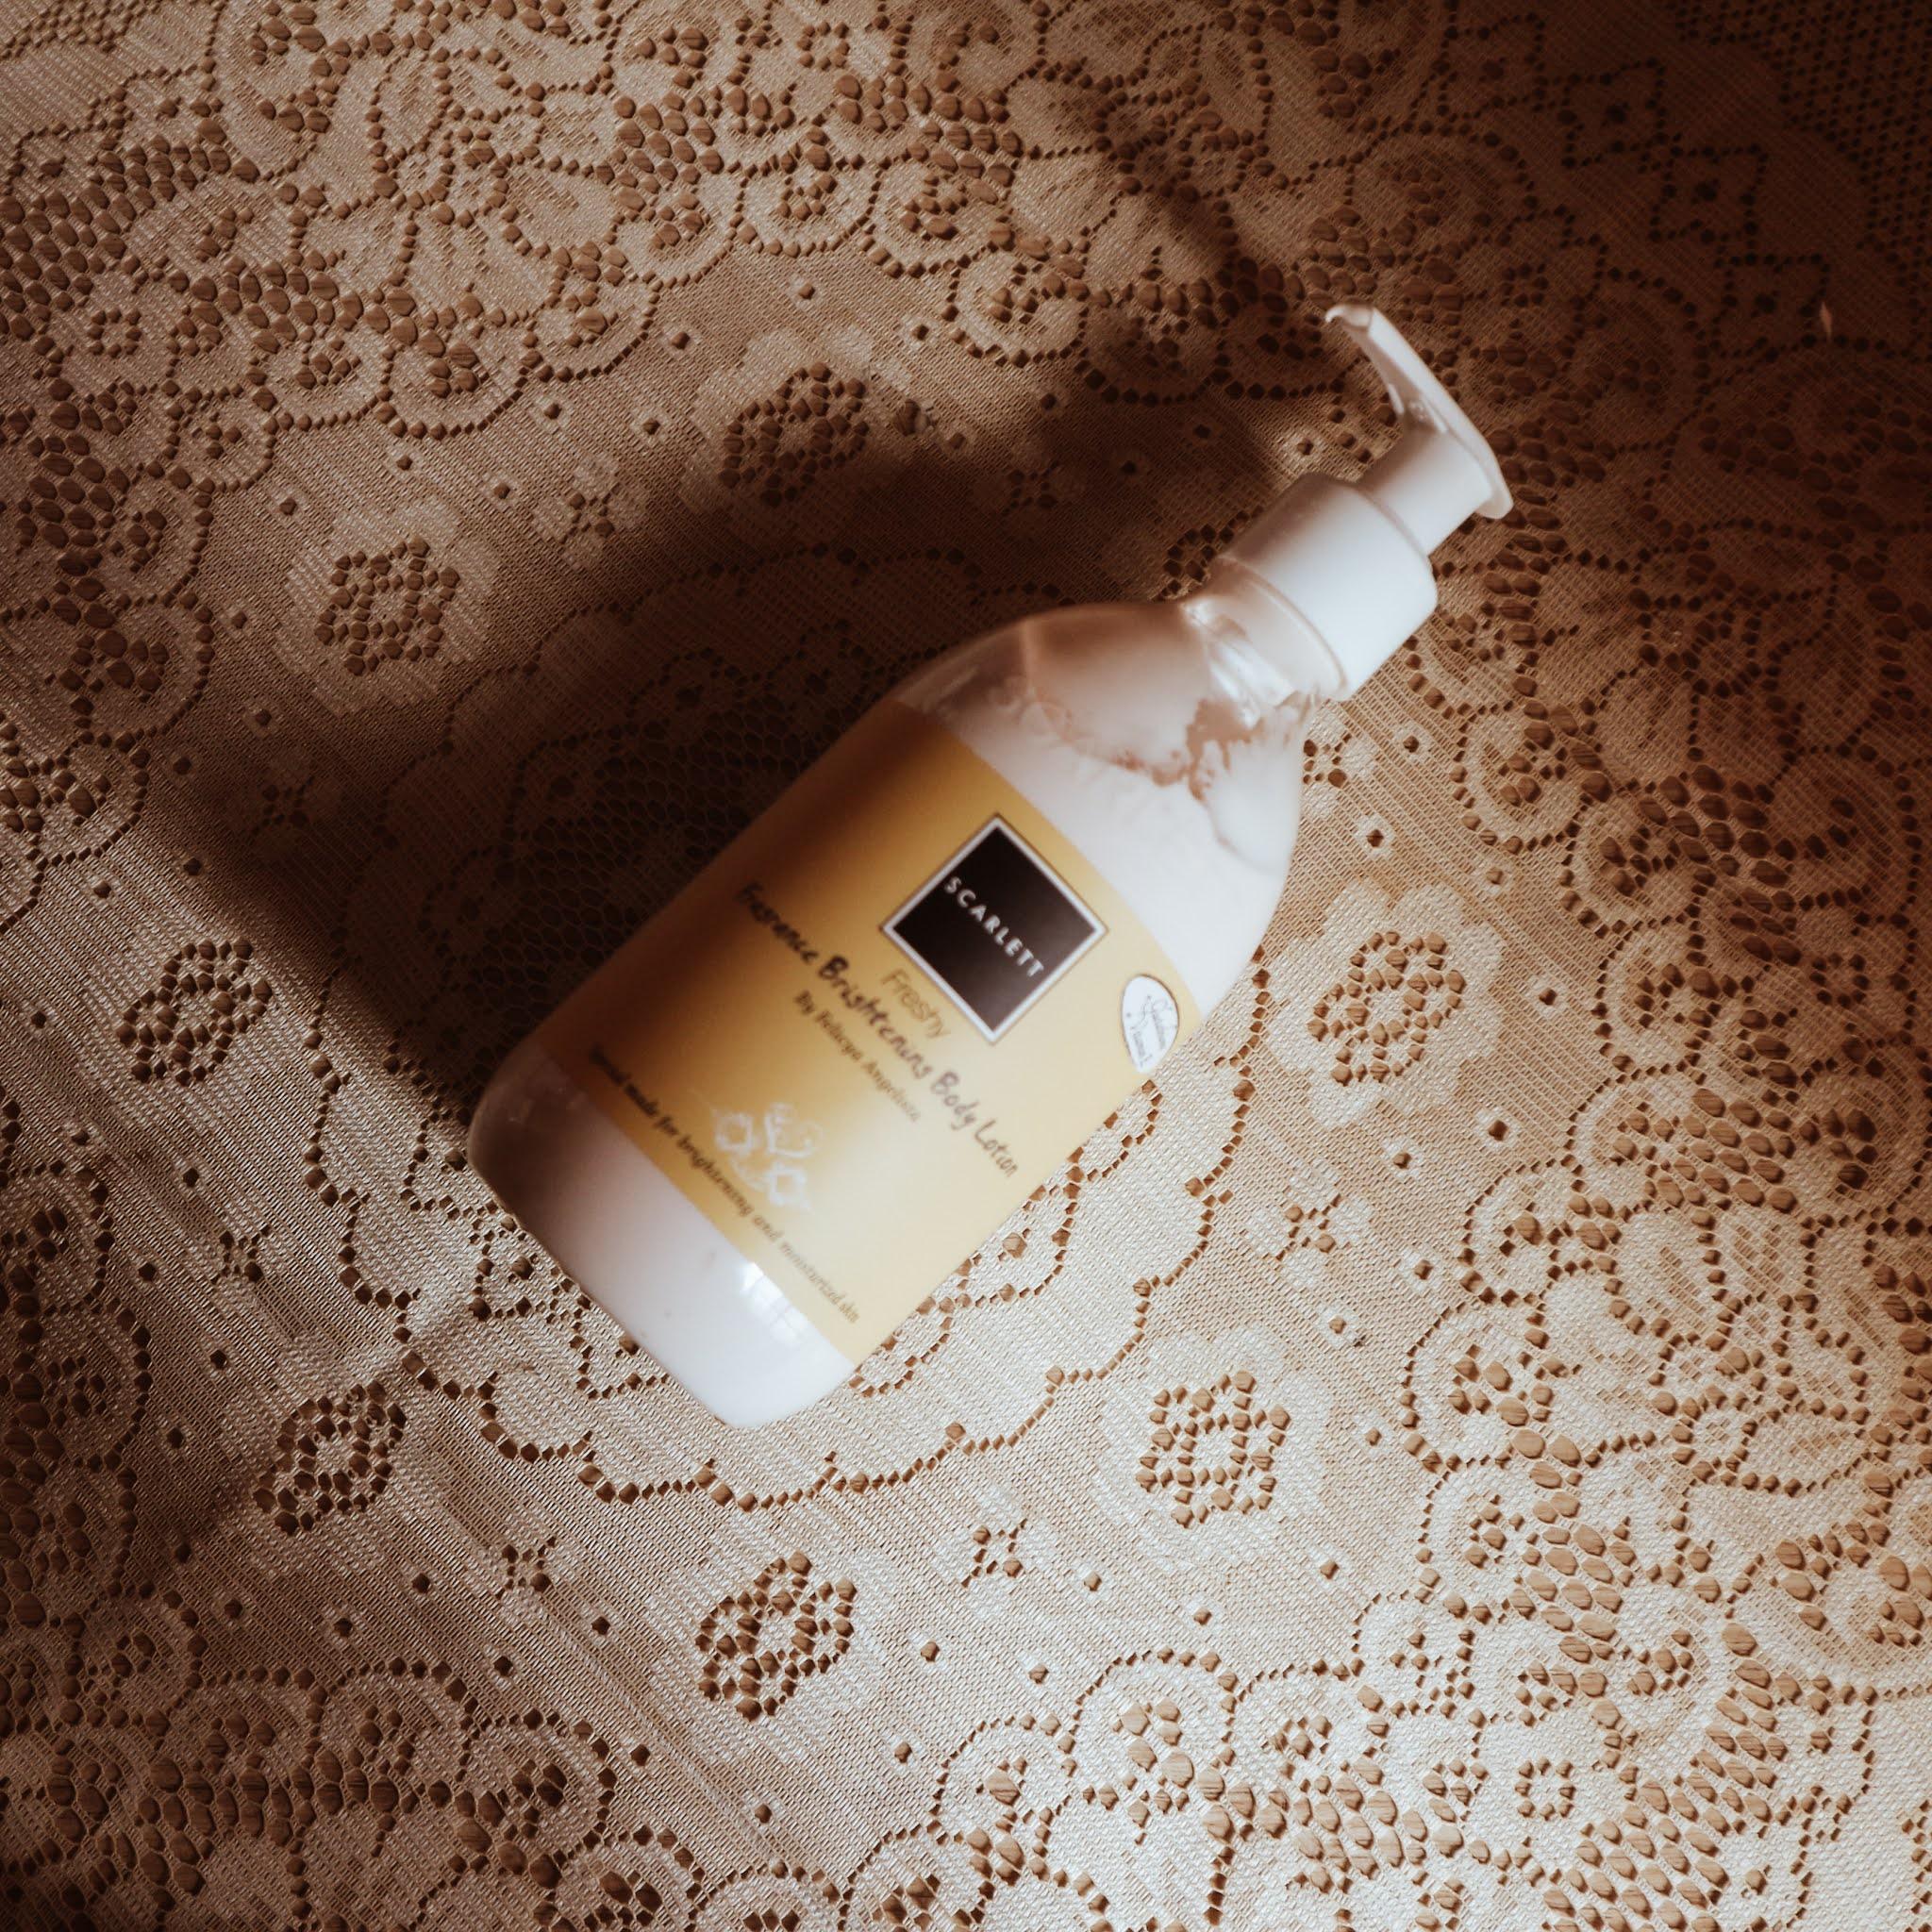 Review Freshy Scarlett Fragrance Brightening Body Lotion